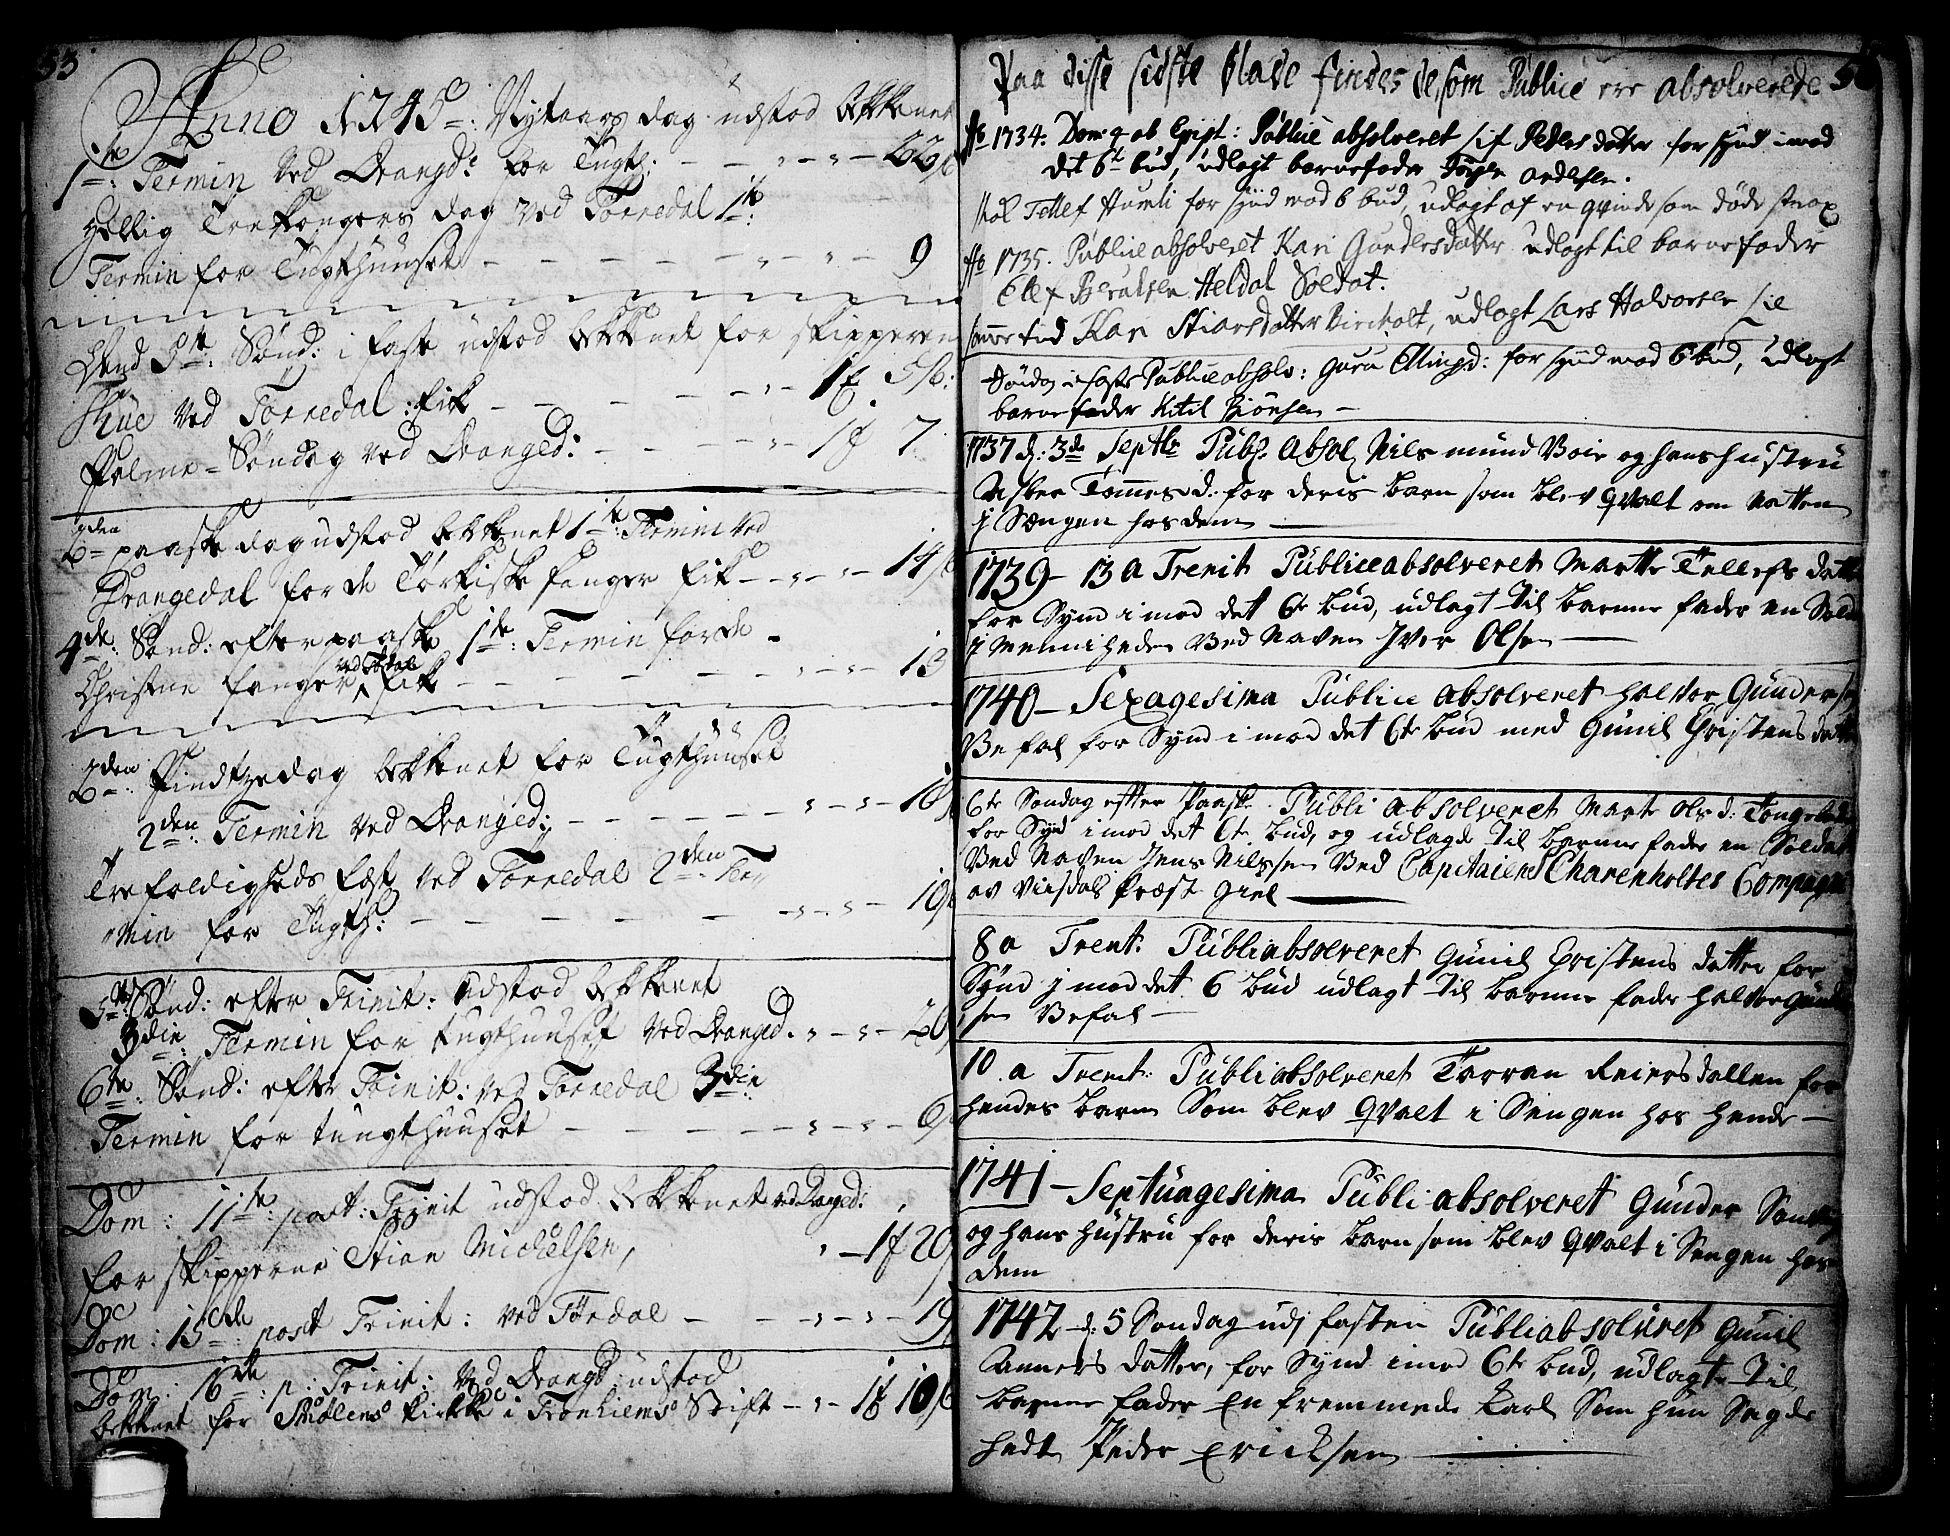 SAKO, Drangedal kirkebøker, F/Fa/L0002: Ministerialbok nr. 2, 1733-1753, s. 53-54